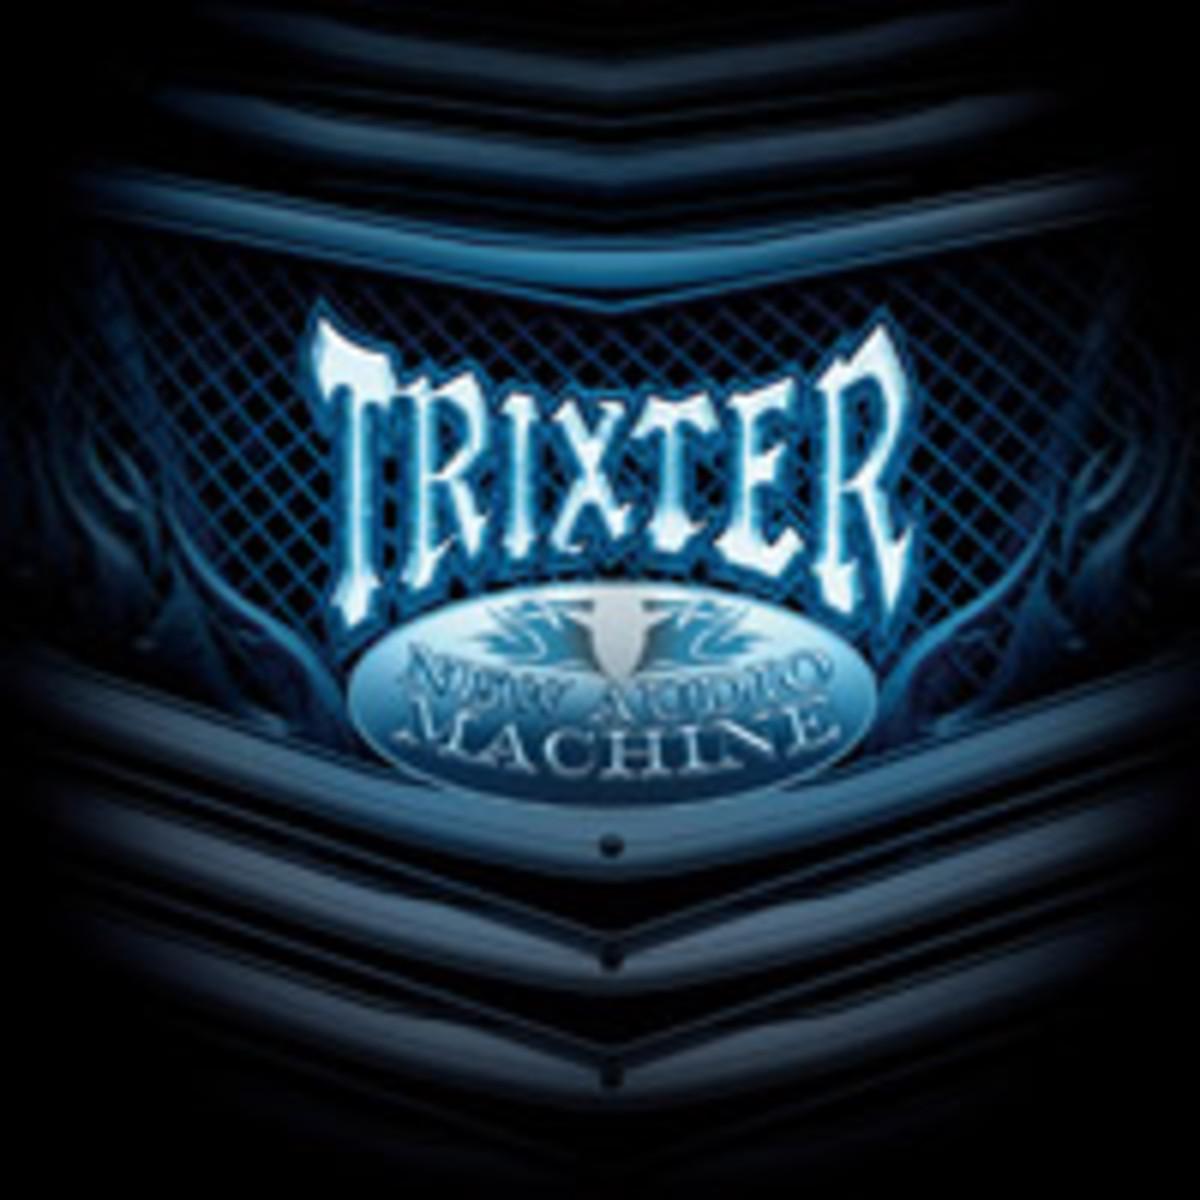 Trixter New Audio Machine